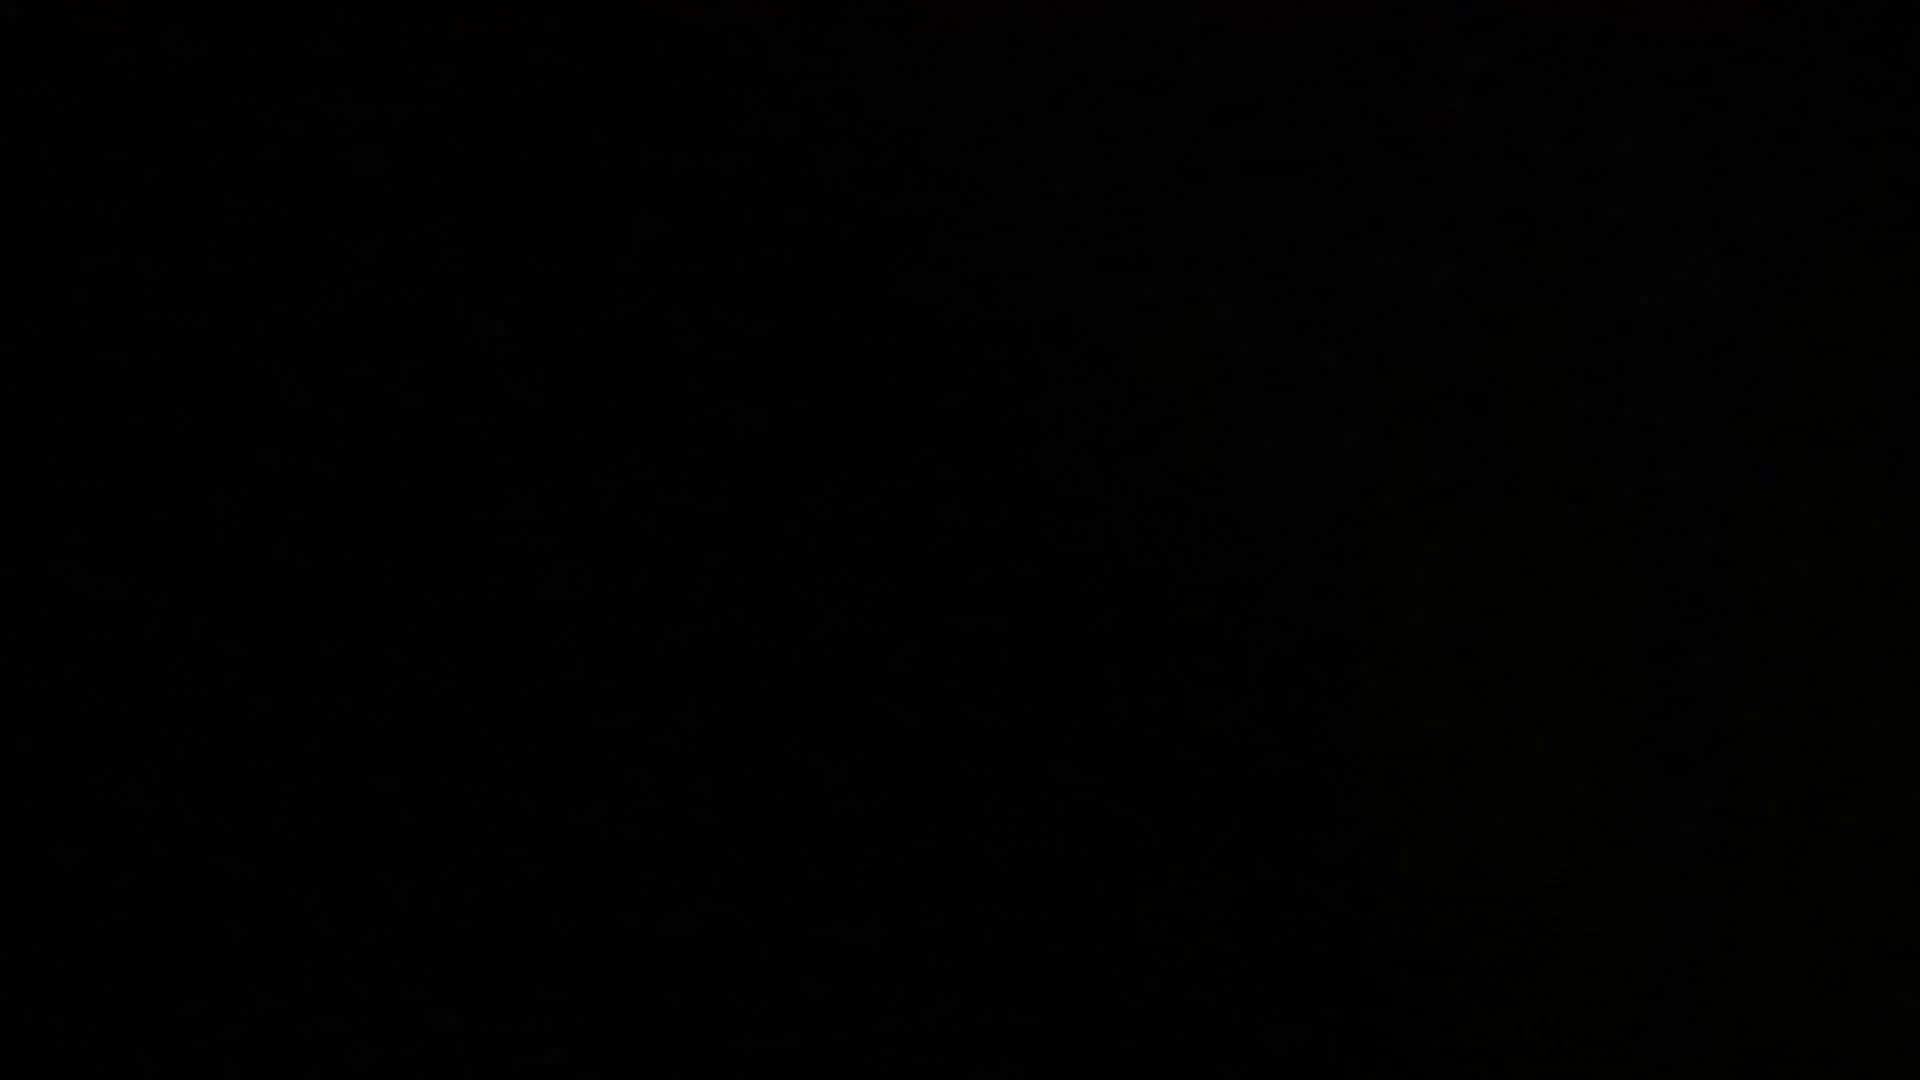 SPYさん初投稿!マンション覗き!5000K!ハイビジョン撮影VOL.05(元サッカー部員社会人) ノンケのオナニー ゲイエロ動画 75連発 47